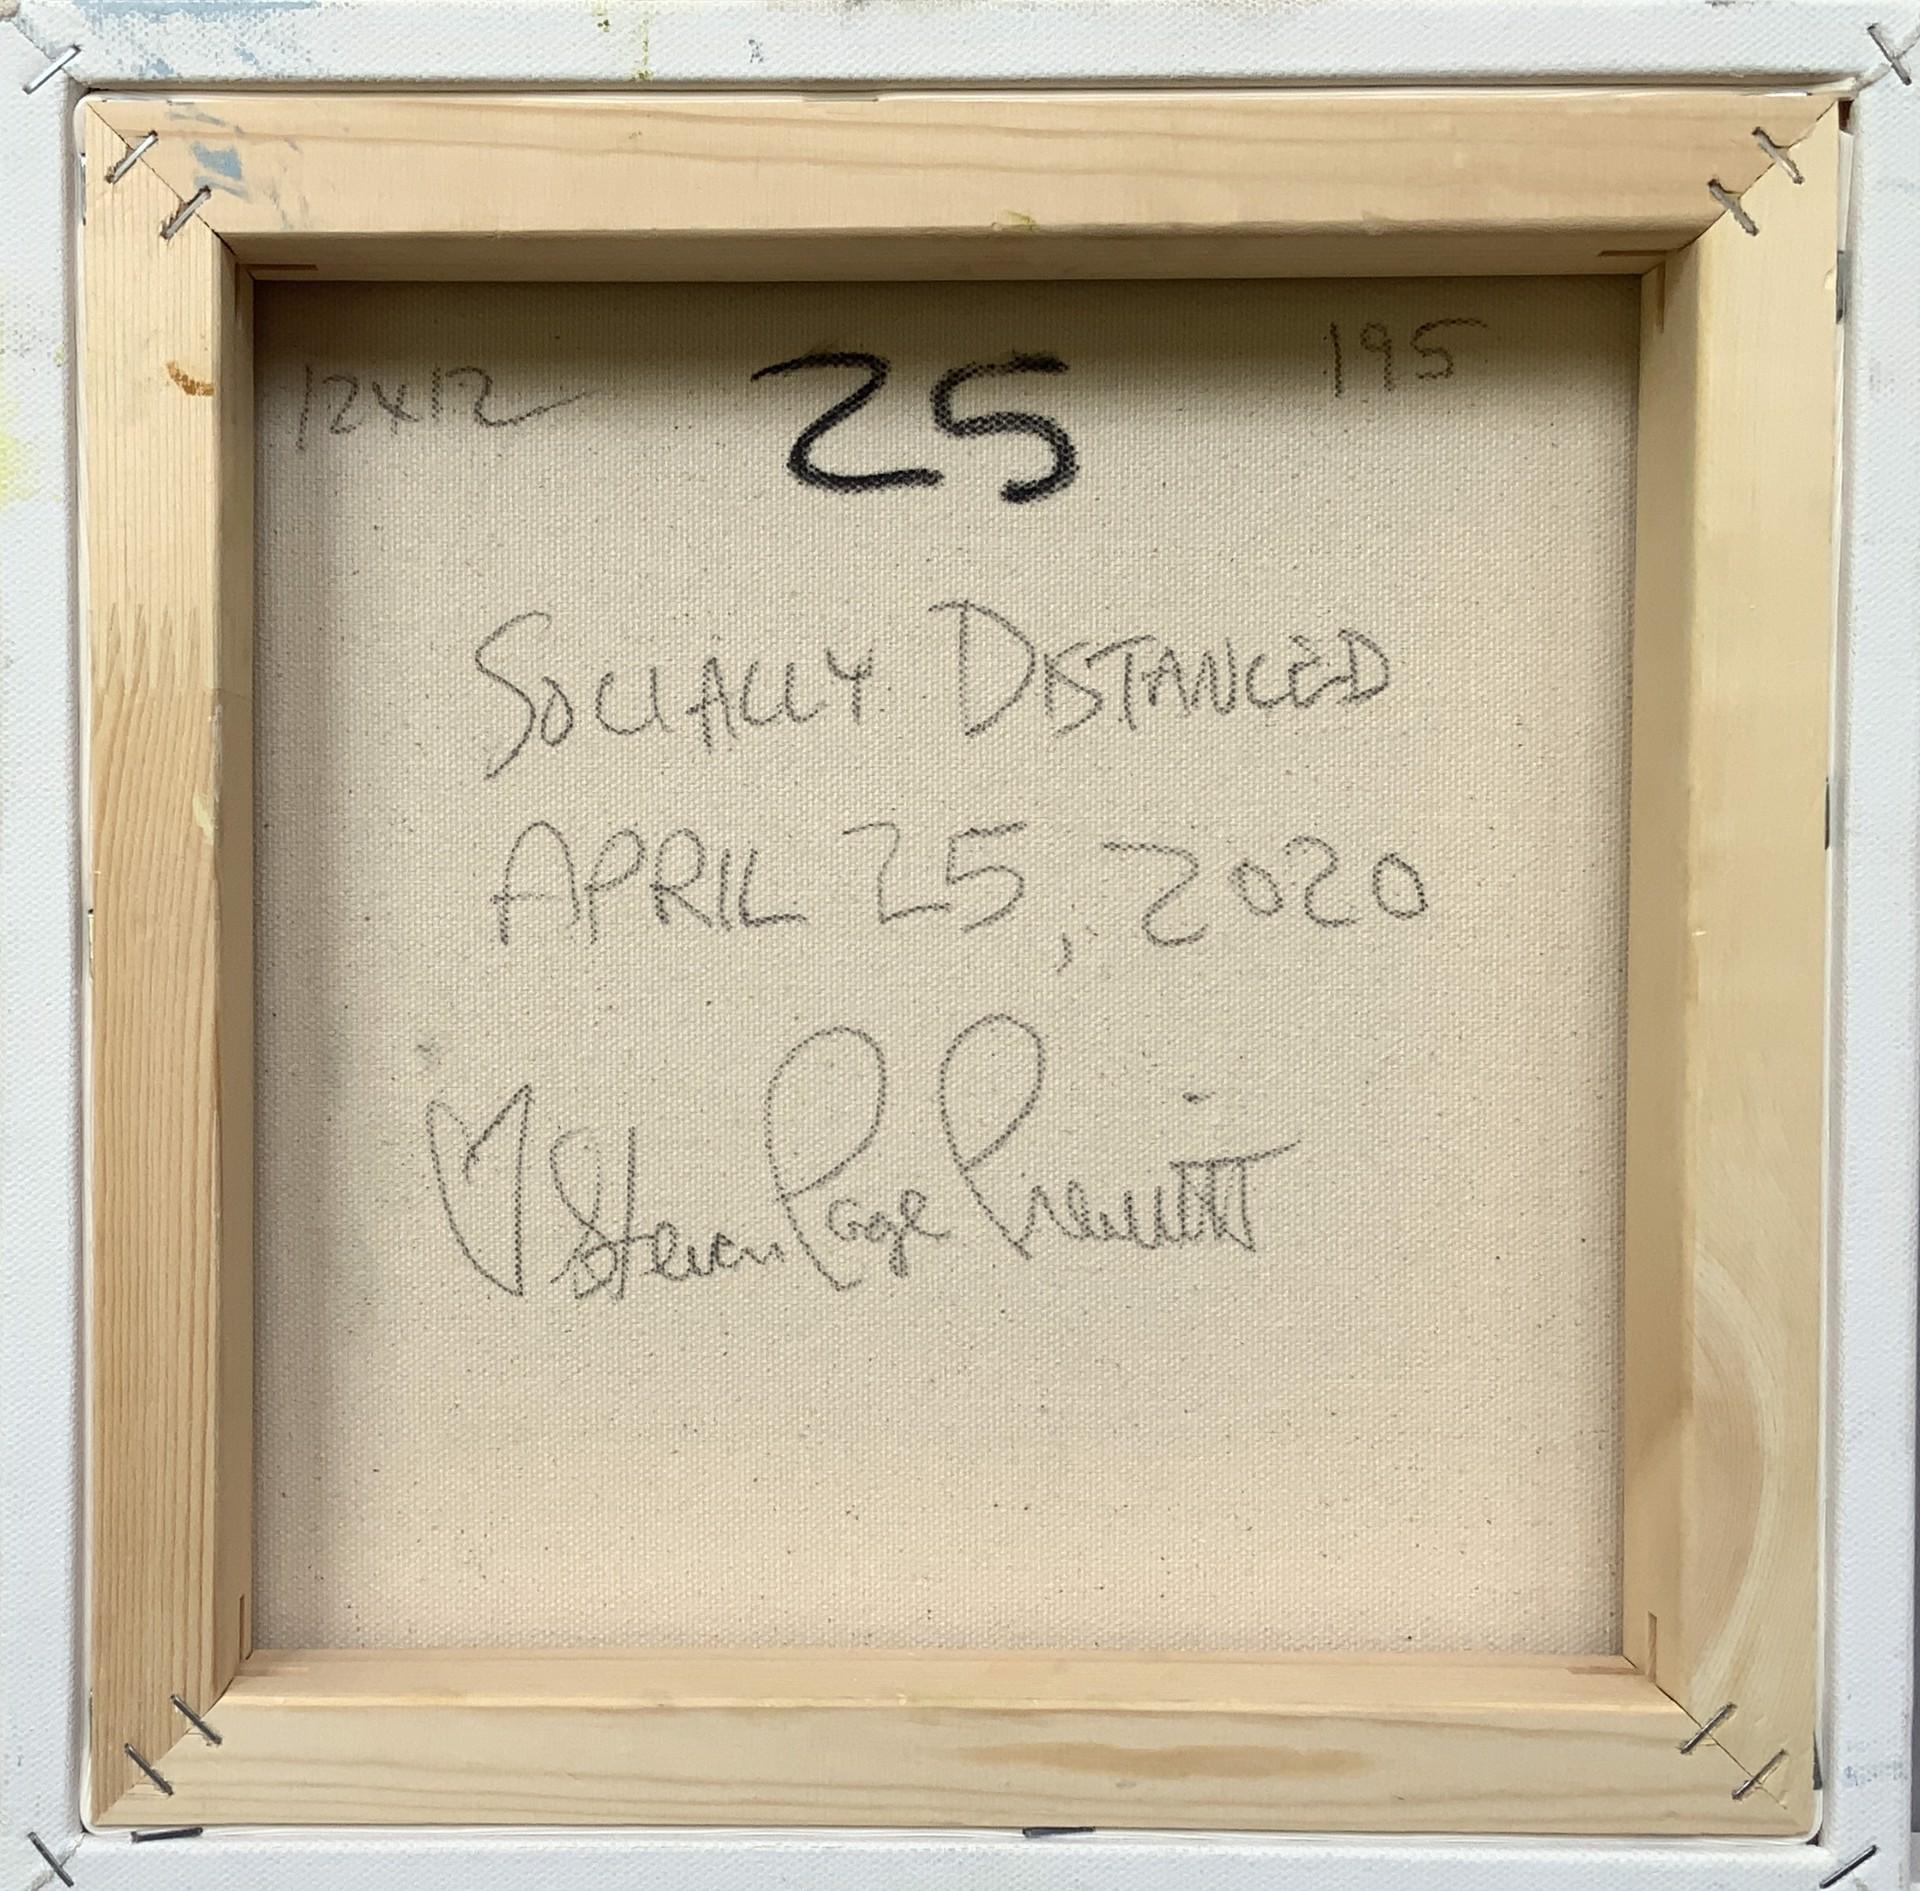 Socially Distanced 25 by Steven Page Prewitt